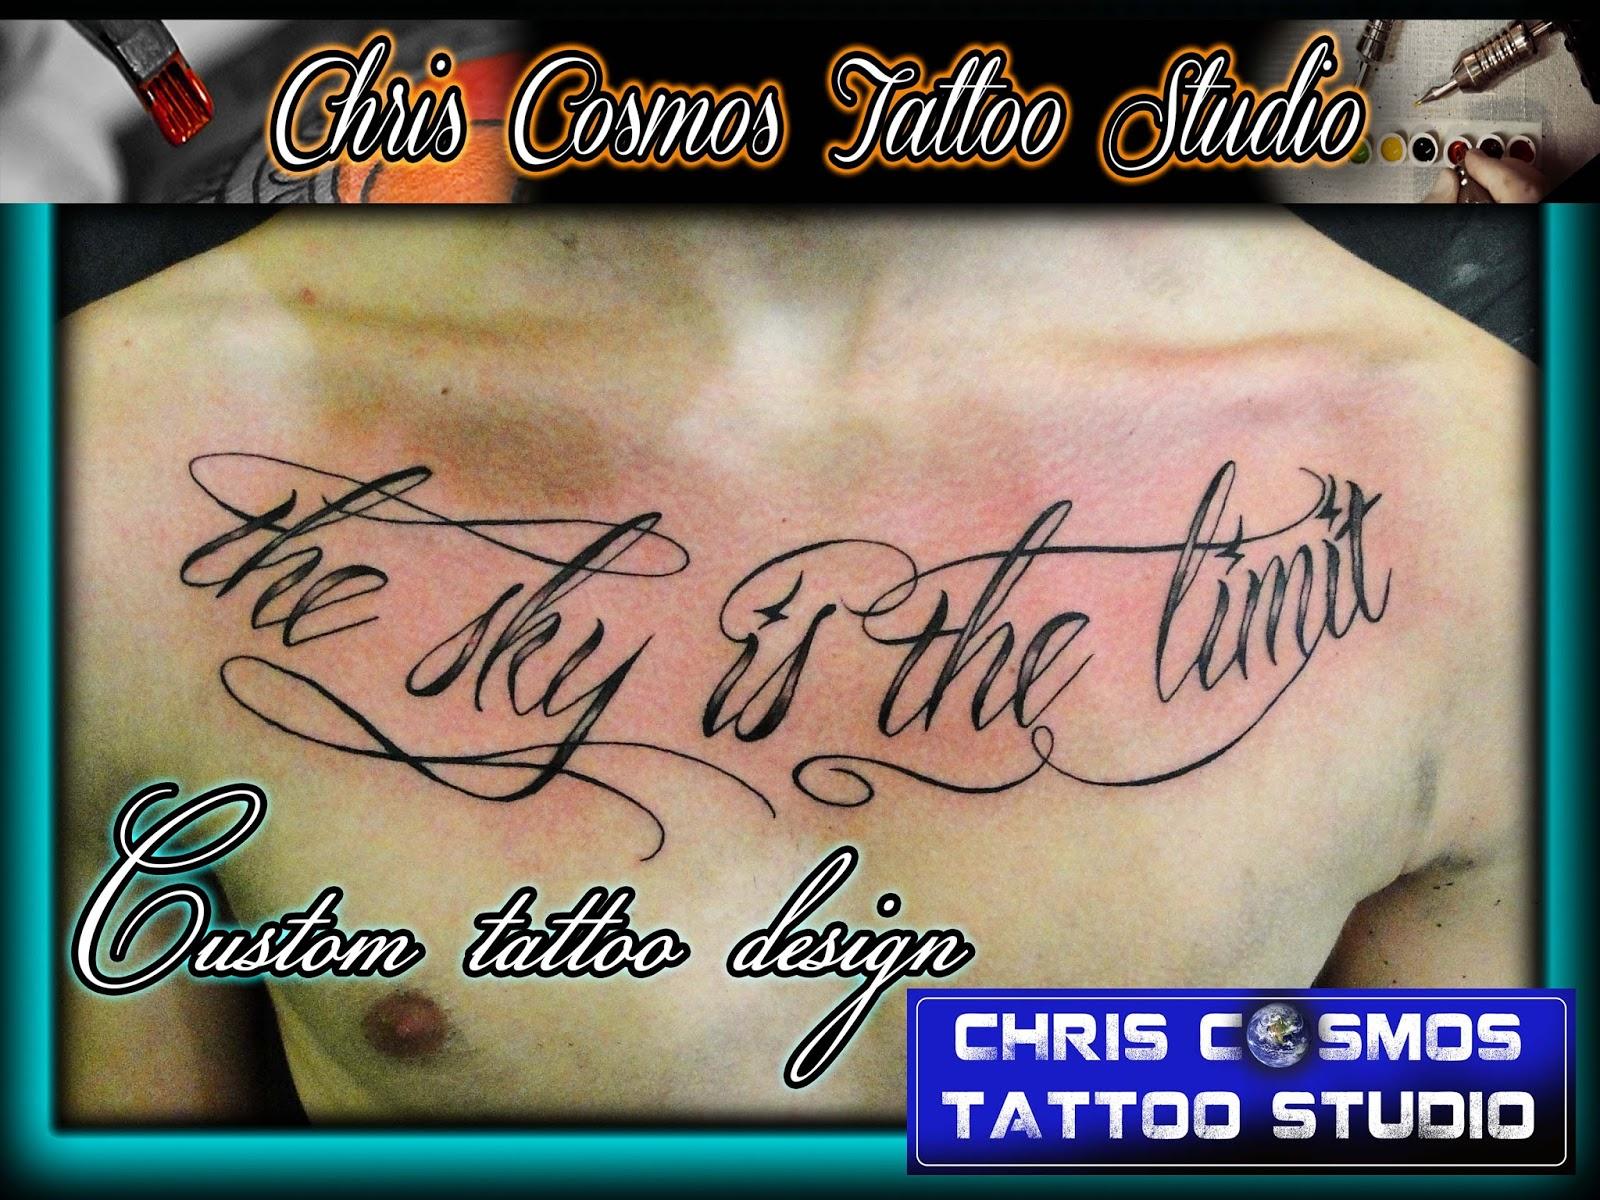 Chris Cosmos Tattoo Studio Limassol Chris Cosmos Tattoo Studio Work